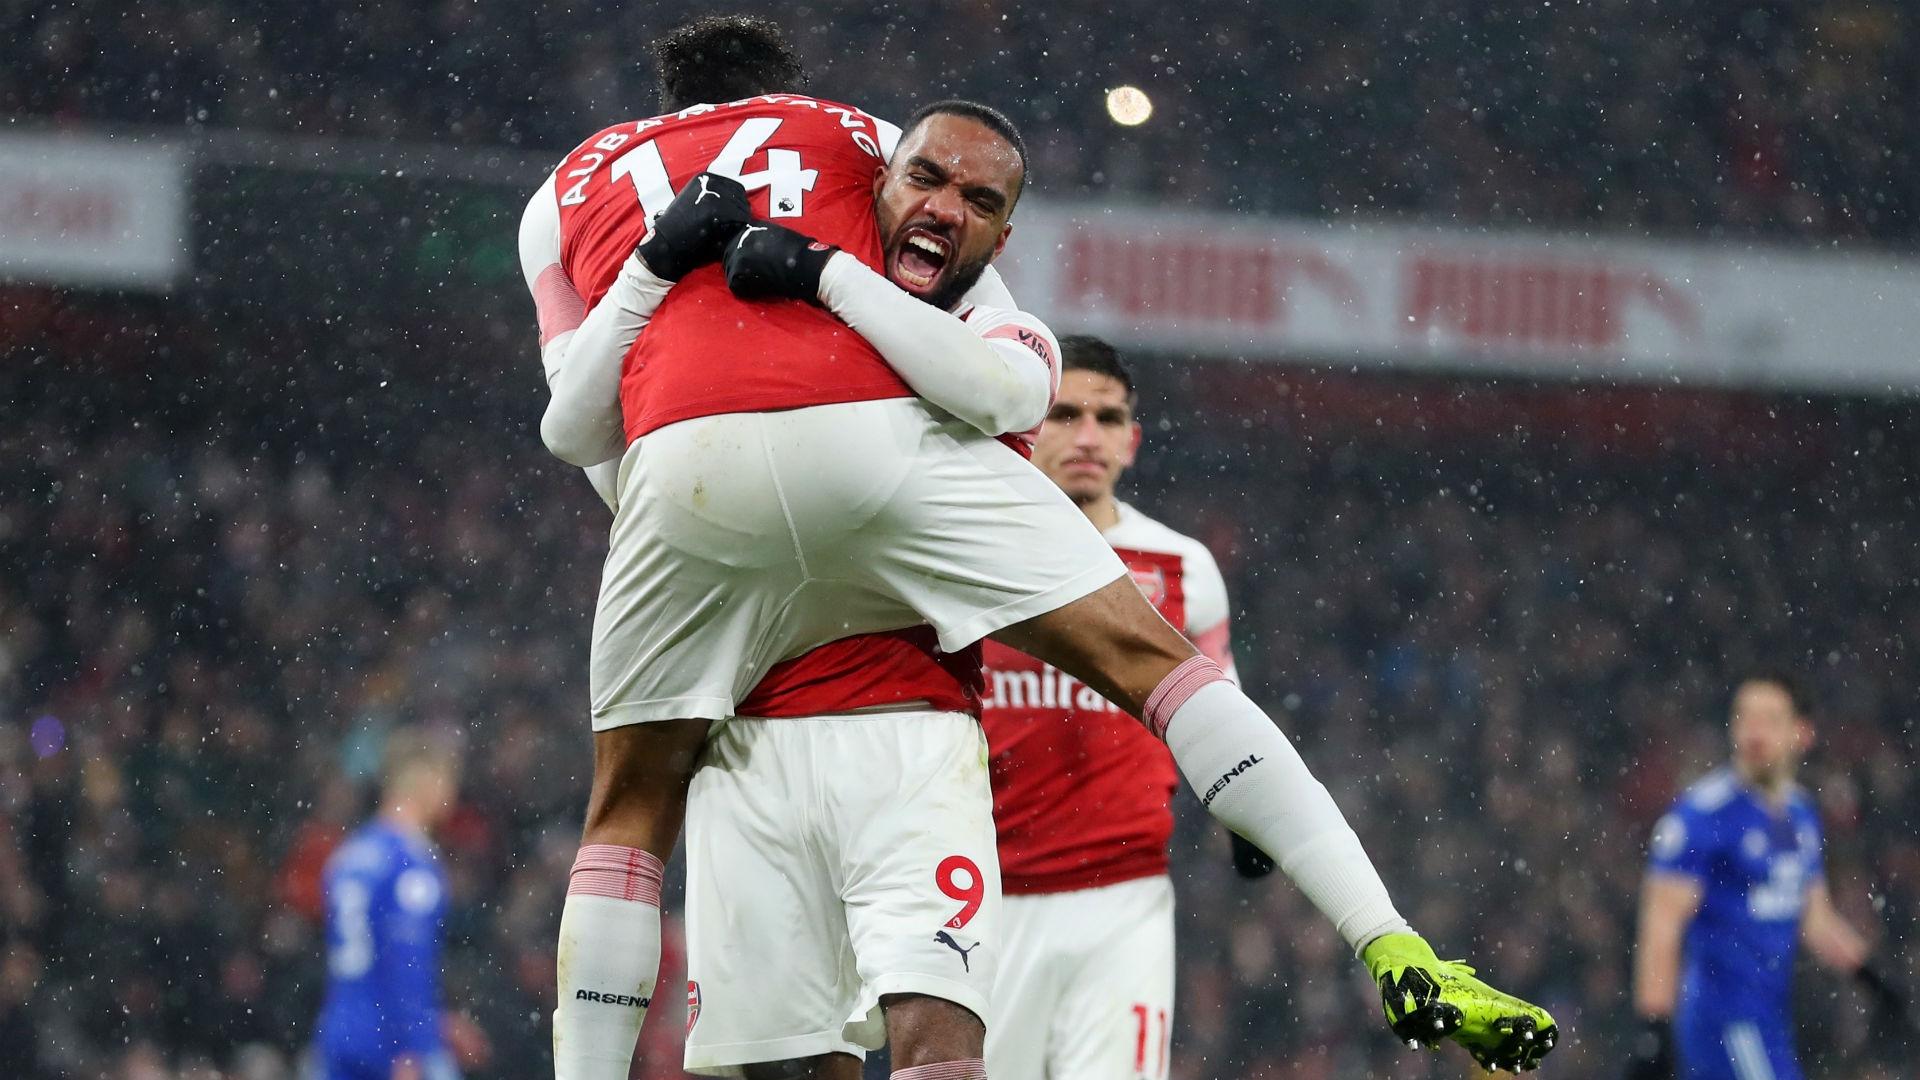 Premier League: Arsenal beat Cardiff 2-1